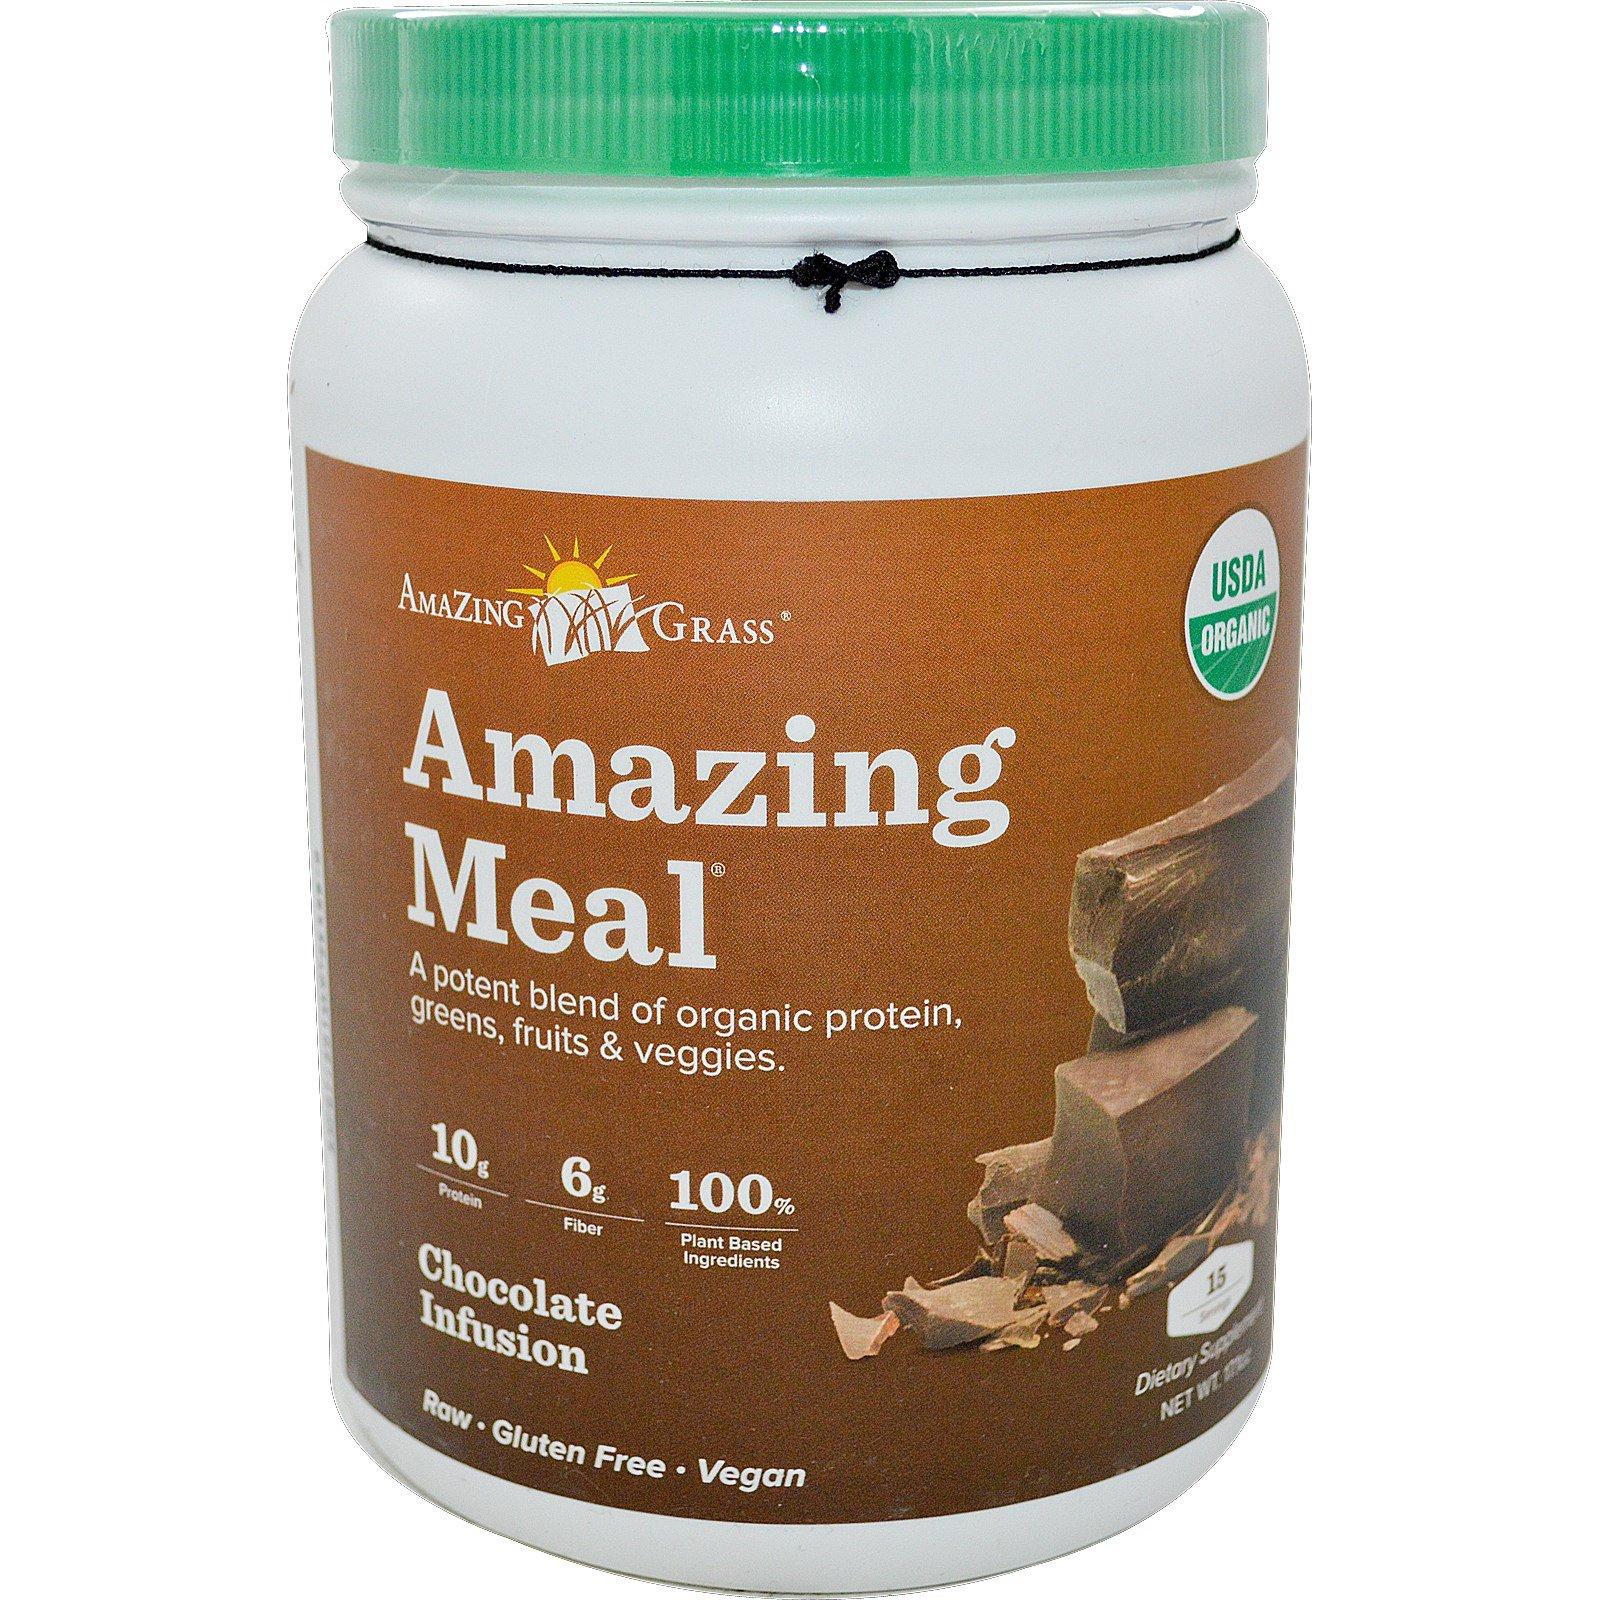 Amazing Grass, Amazing Meal, Chocolate Infusion, 17.1 oz - iHerb.com